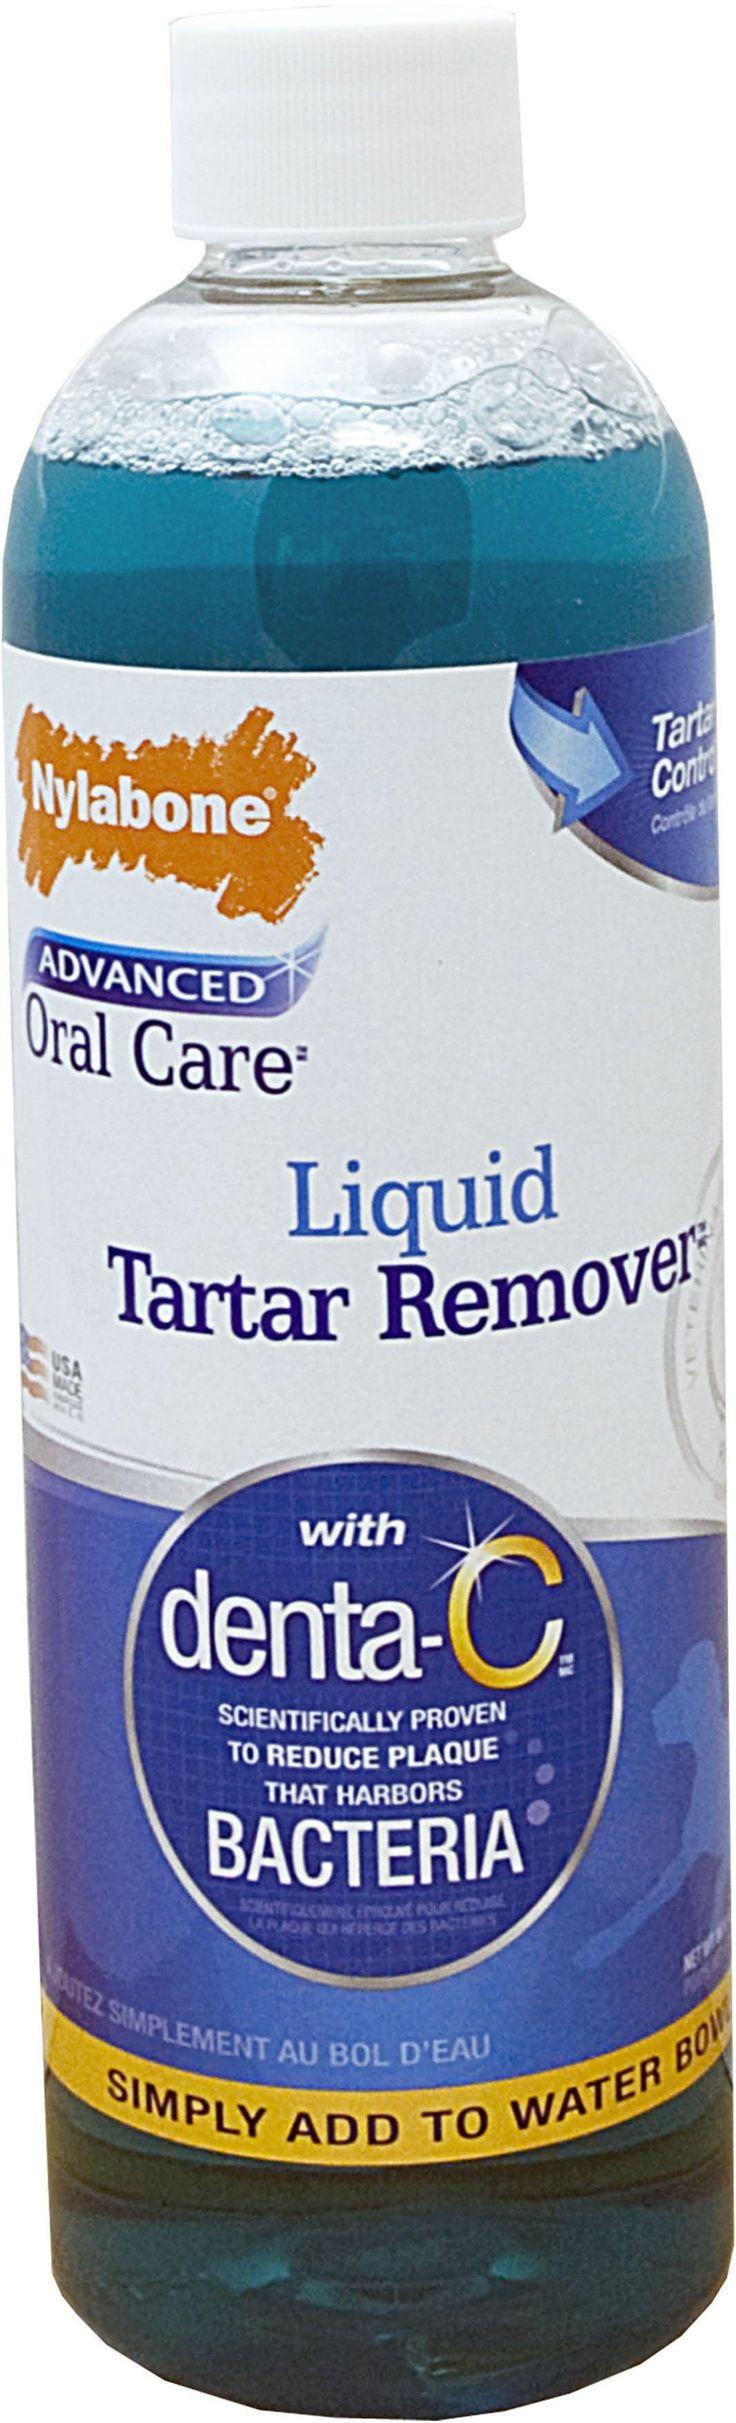 Nylabone Corp (bones) - Advanced Oral Care Liquid Tartar Remover